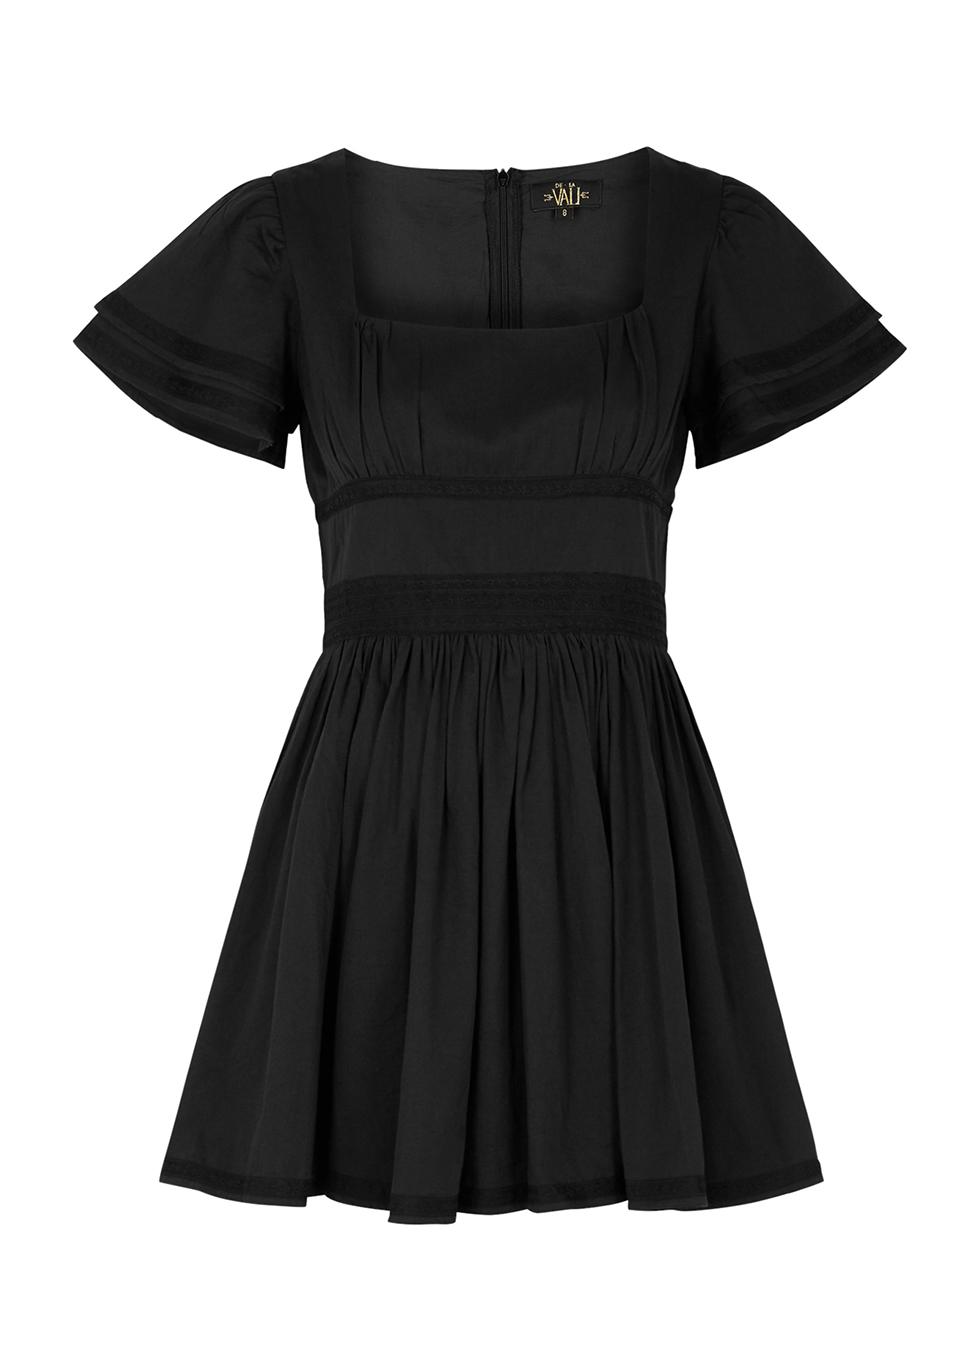 Chiquilla black cotton mini dress